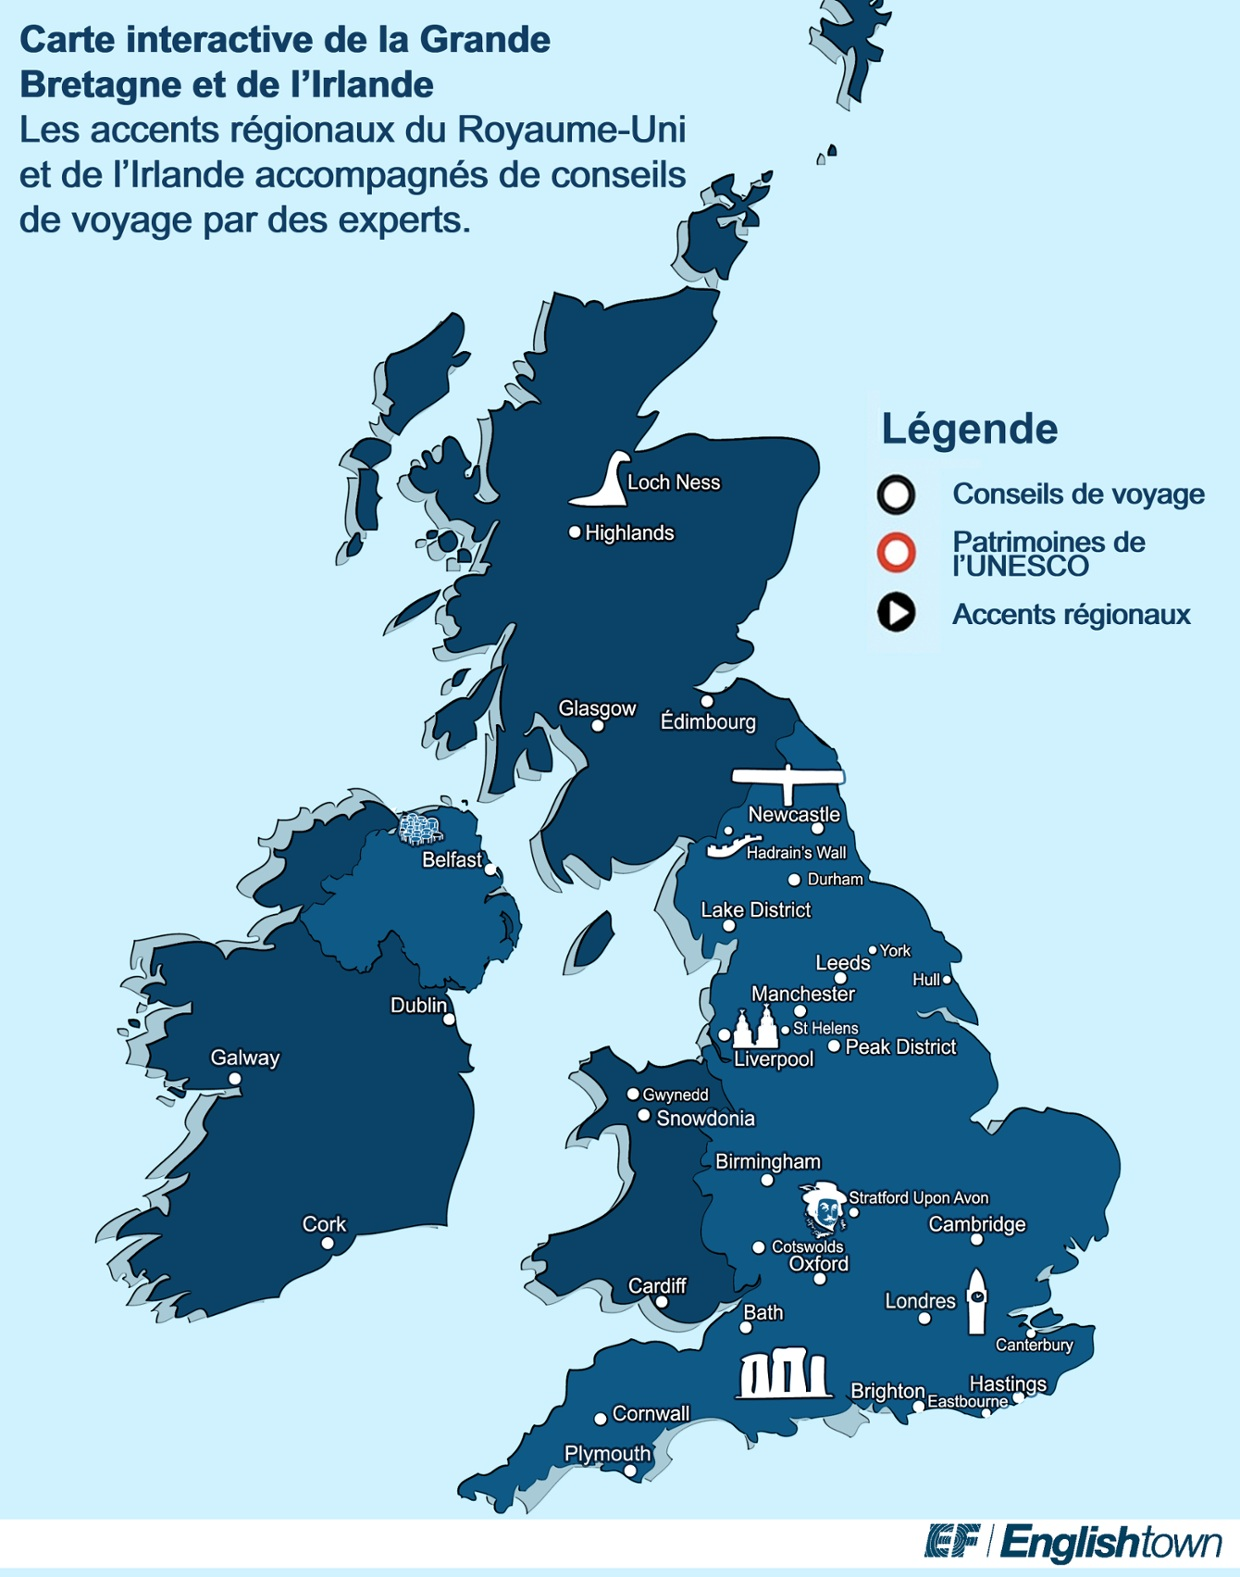 Carte interactive de la grande bretagne et de l 39 irlande - Office du tourisme de grande bretagne ...